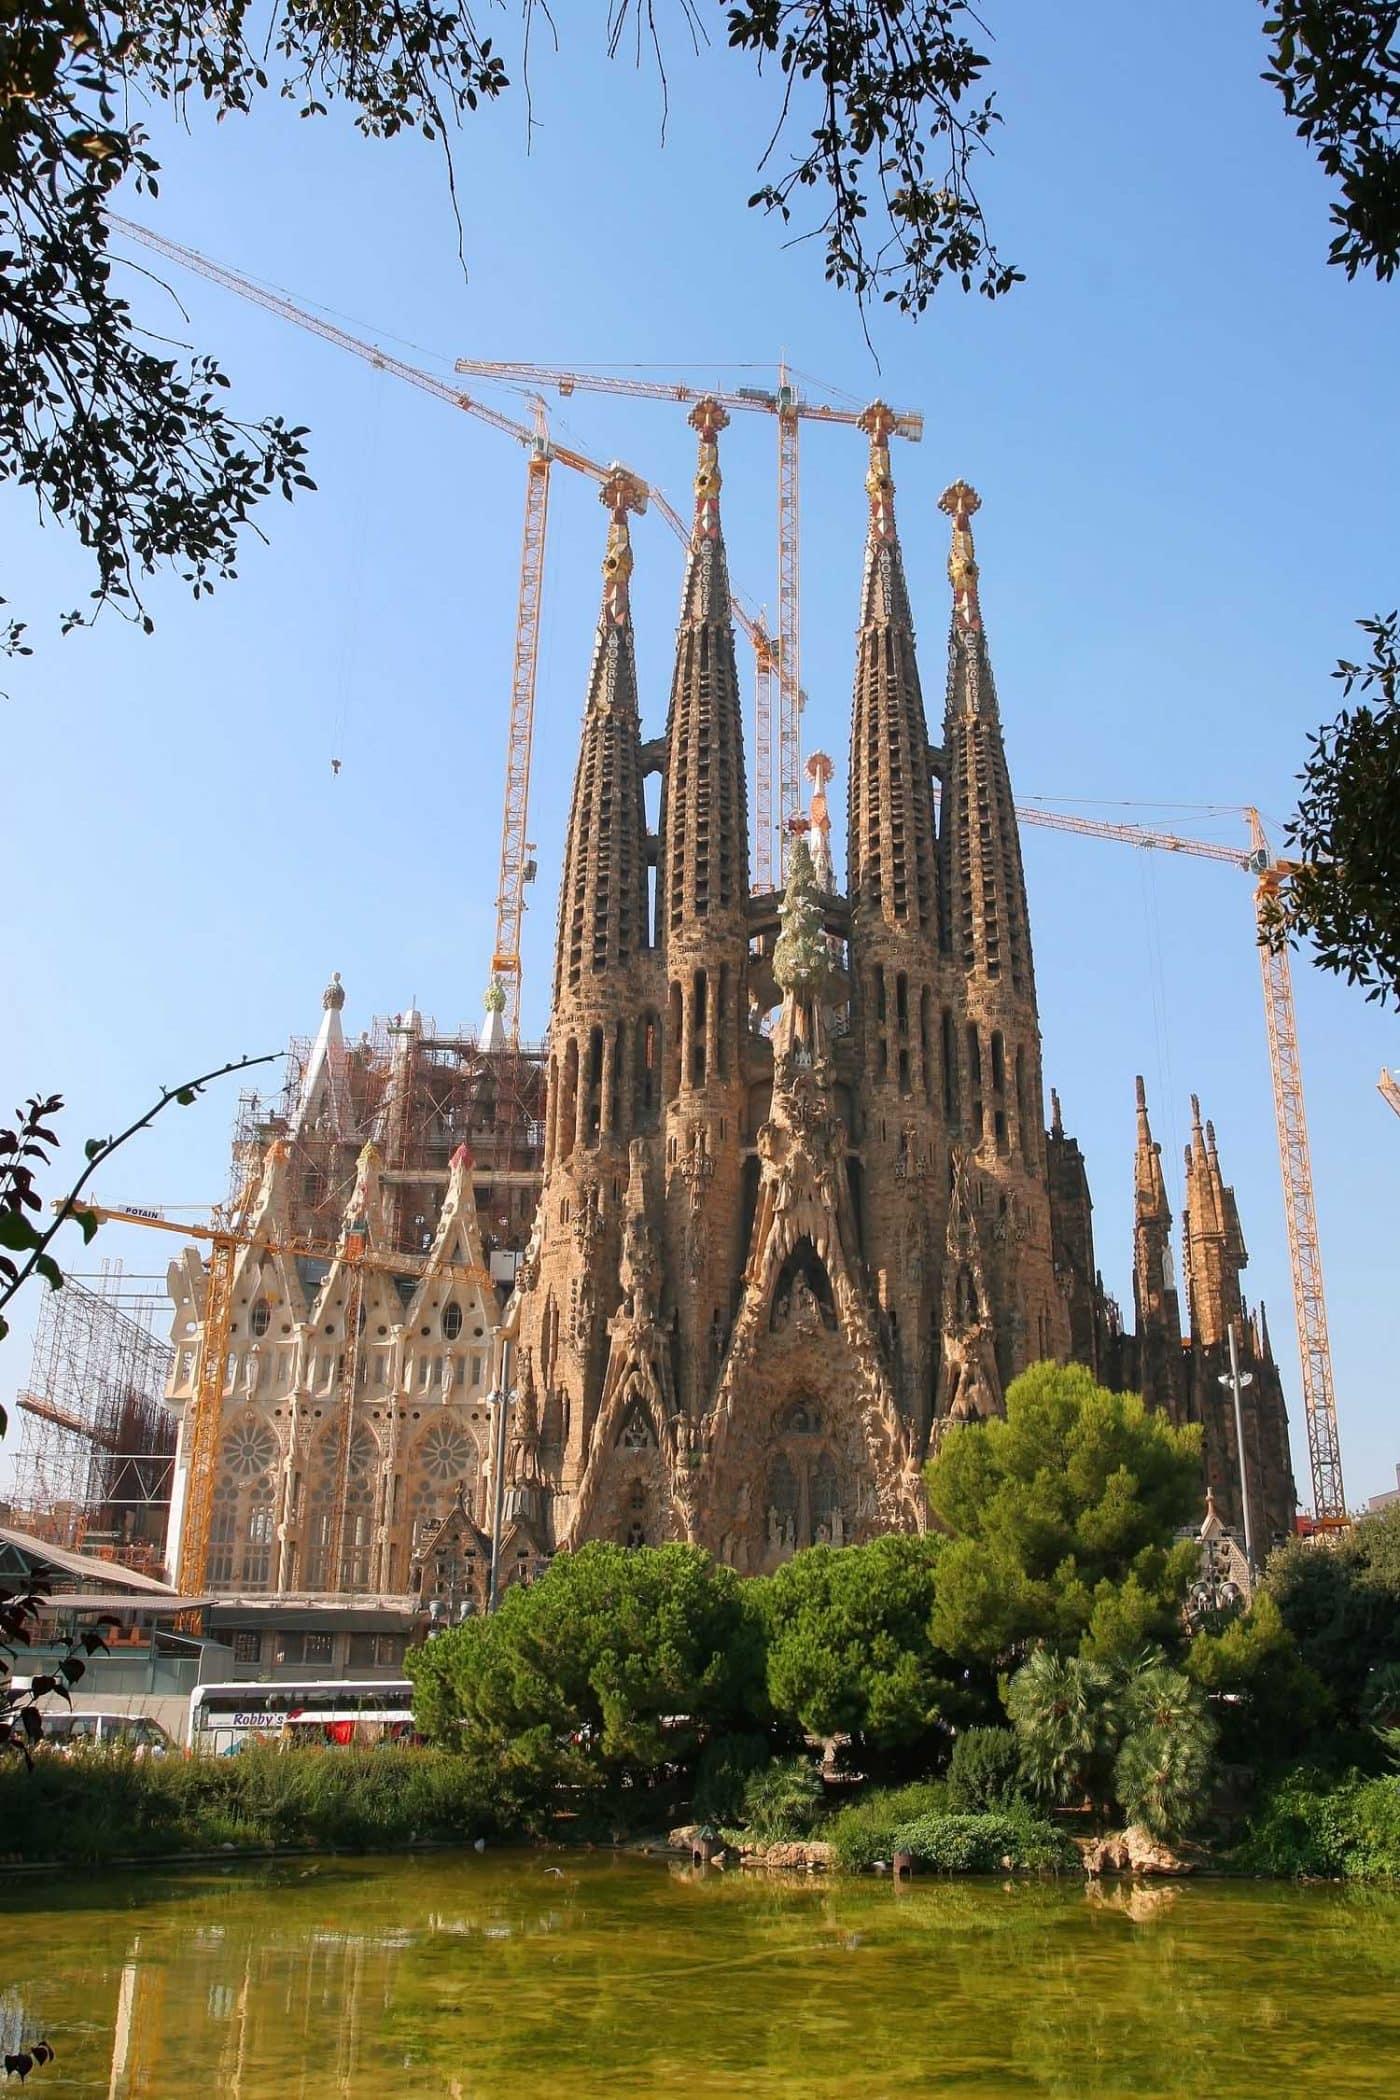 SiNG in Spain: Sagrada Familia's Future Look